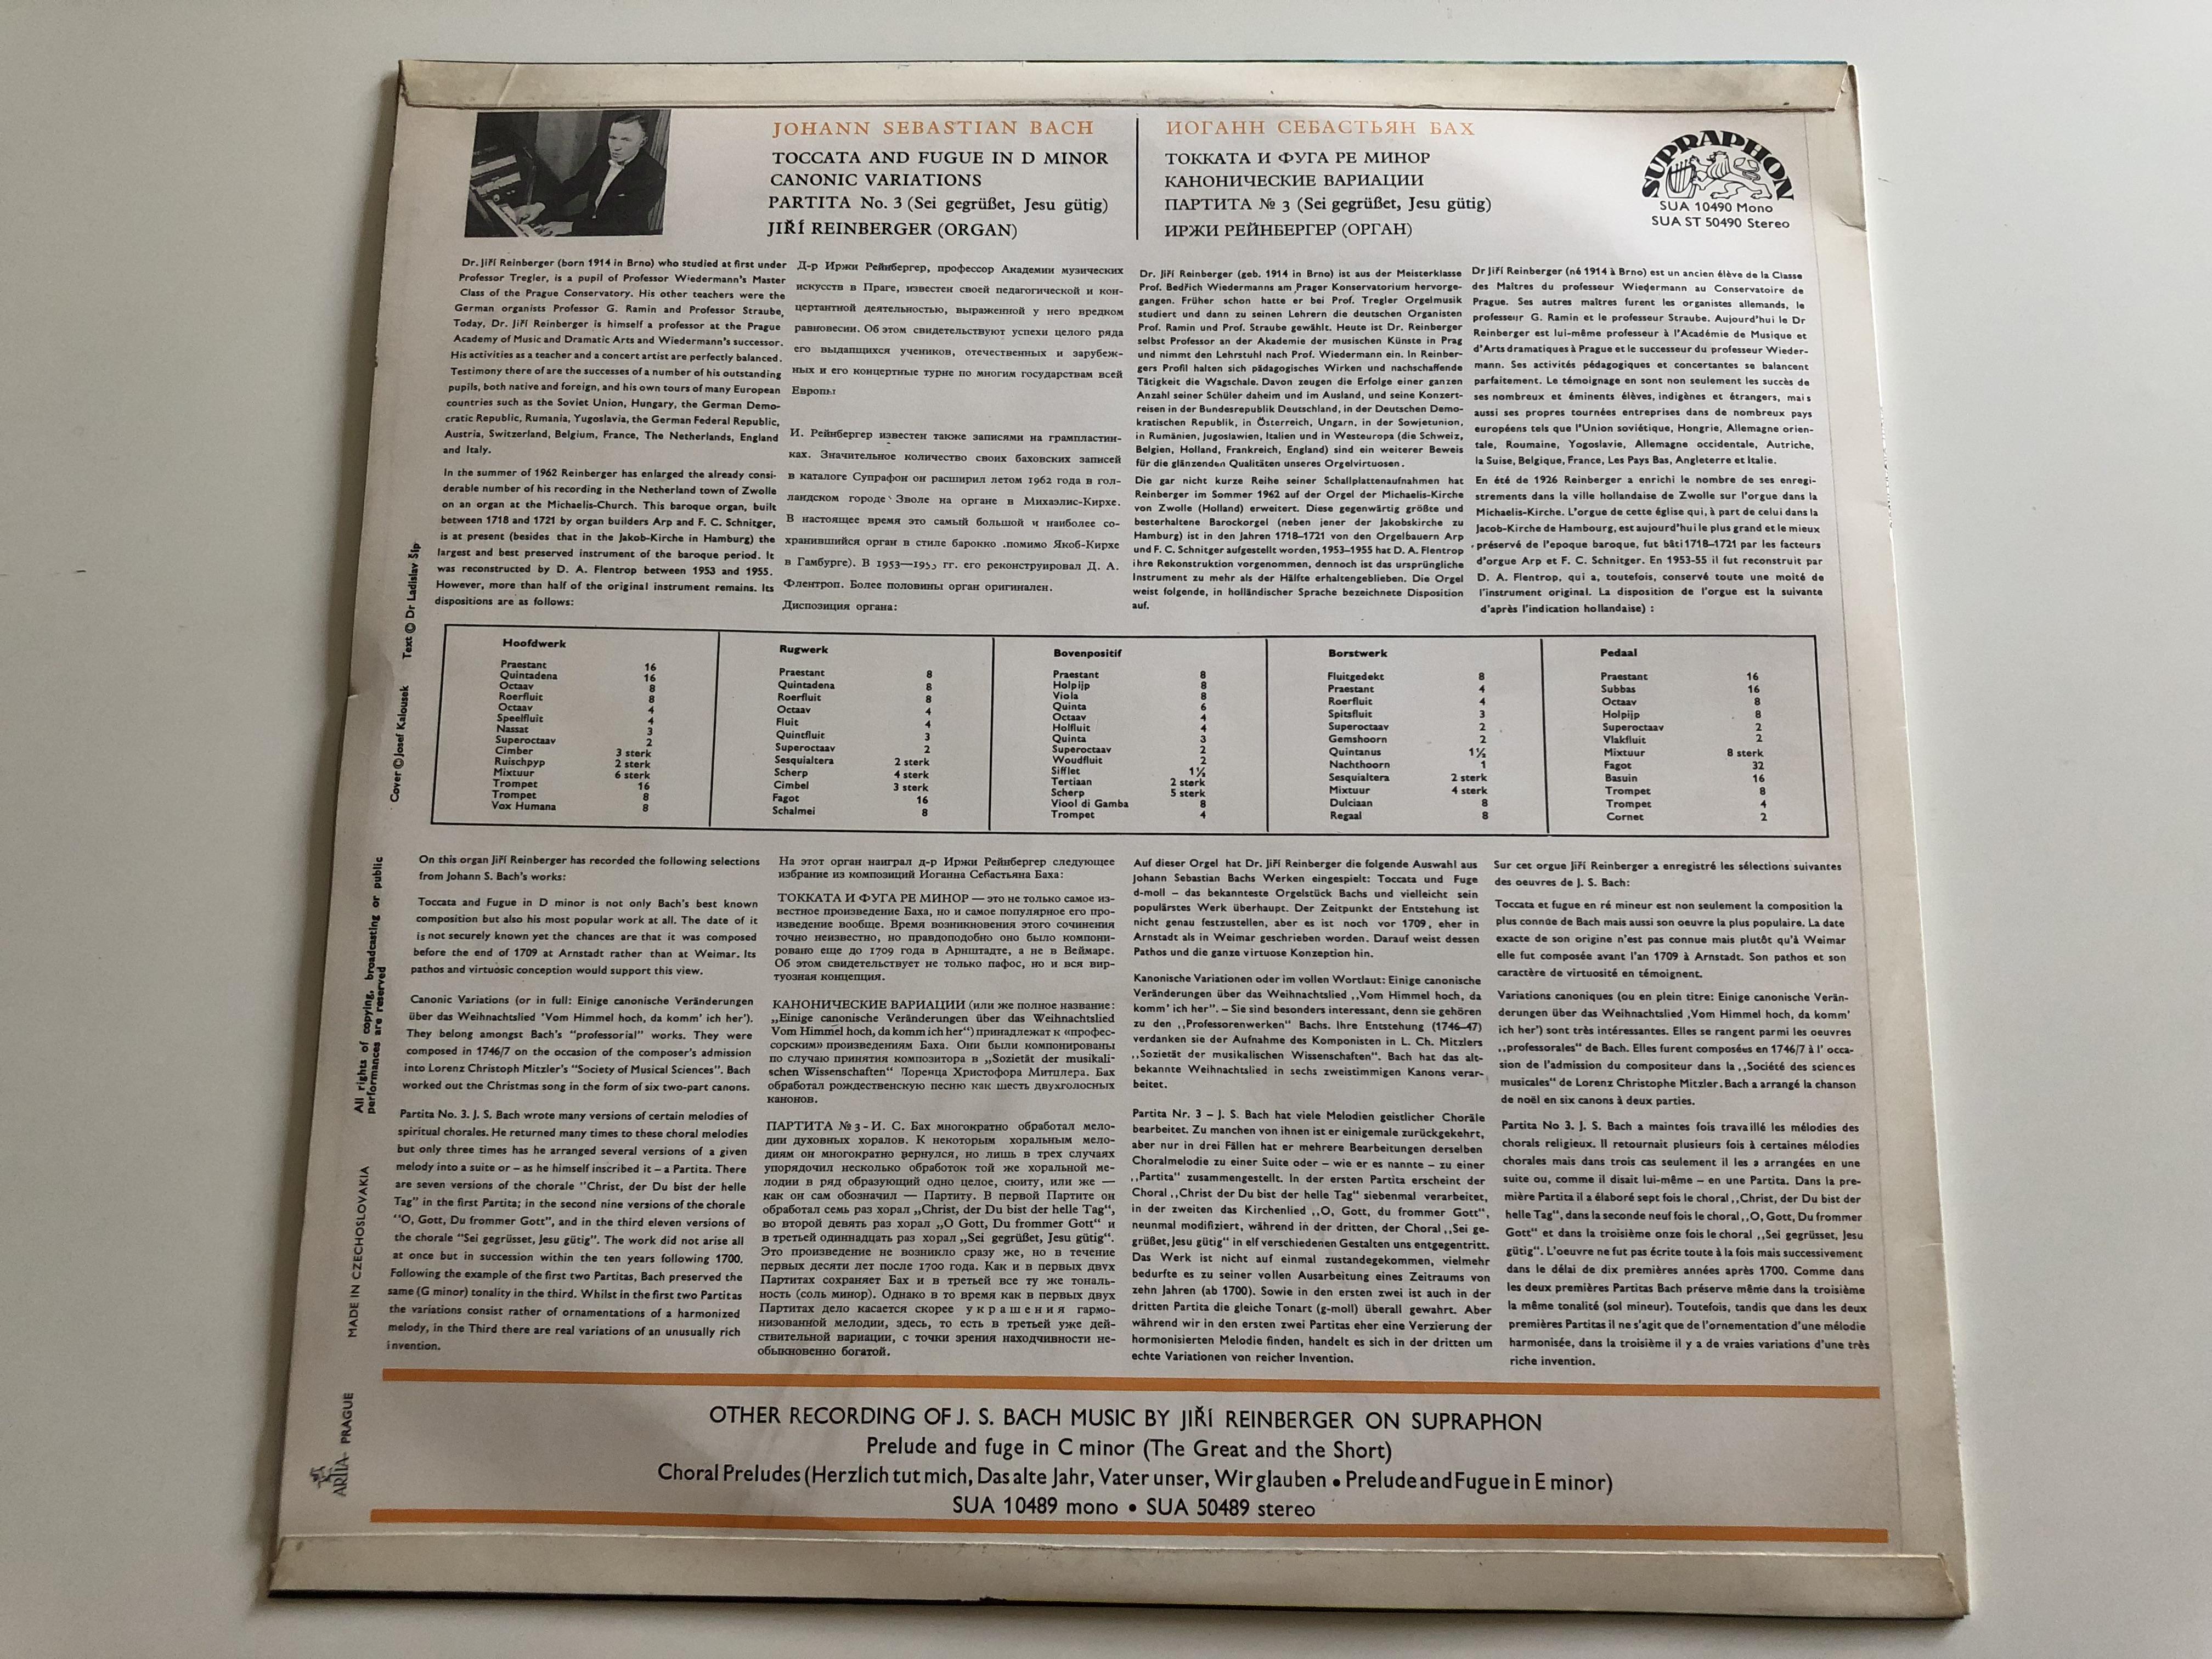 j-s-bach-organ-music-toccata-and-fugue-in-d-minor-partita-no.3-canonic-variations-ji-reinberger-supraphon-lp-stereo-sua-st-50490-sua-10490-2-.jpg